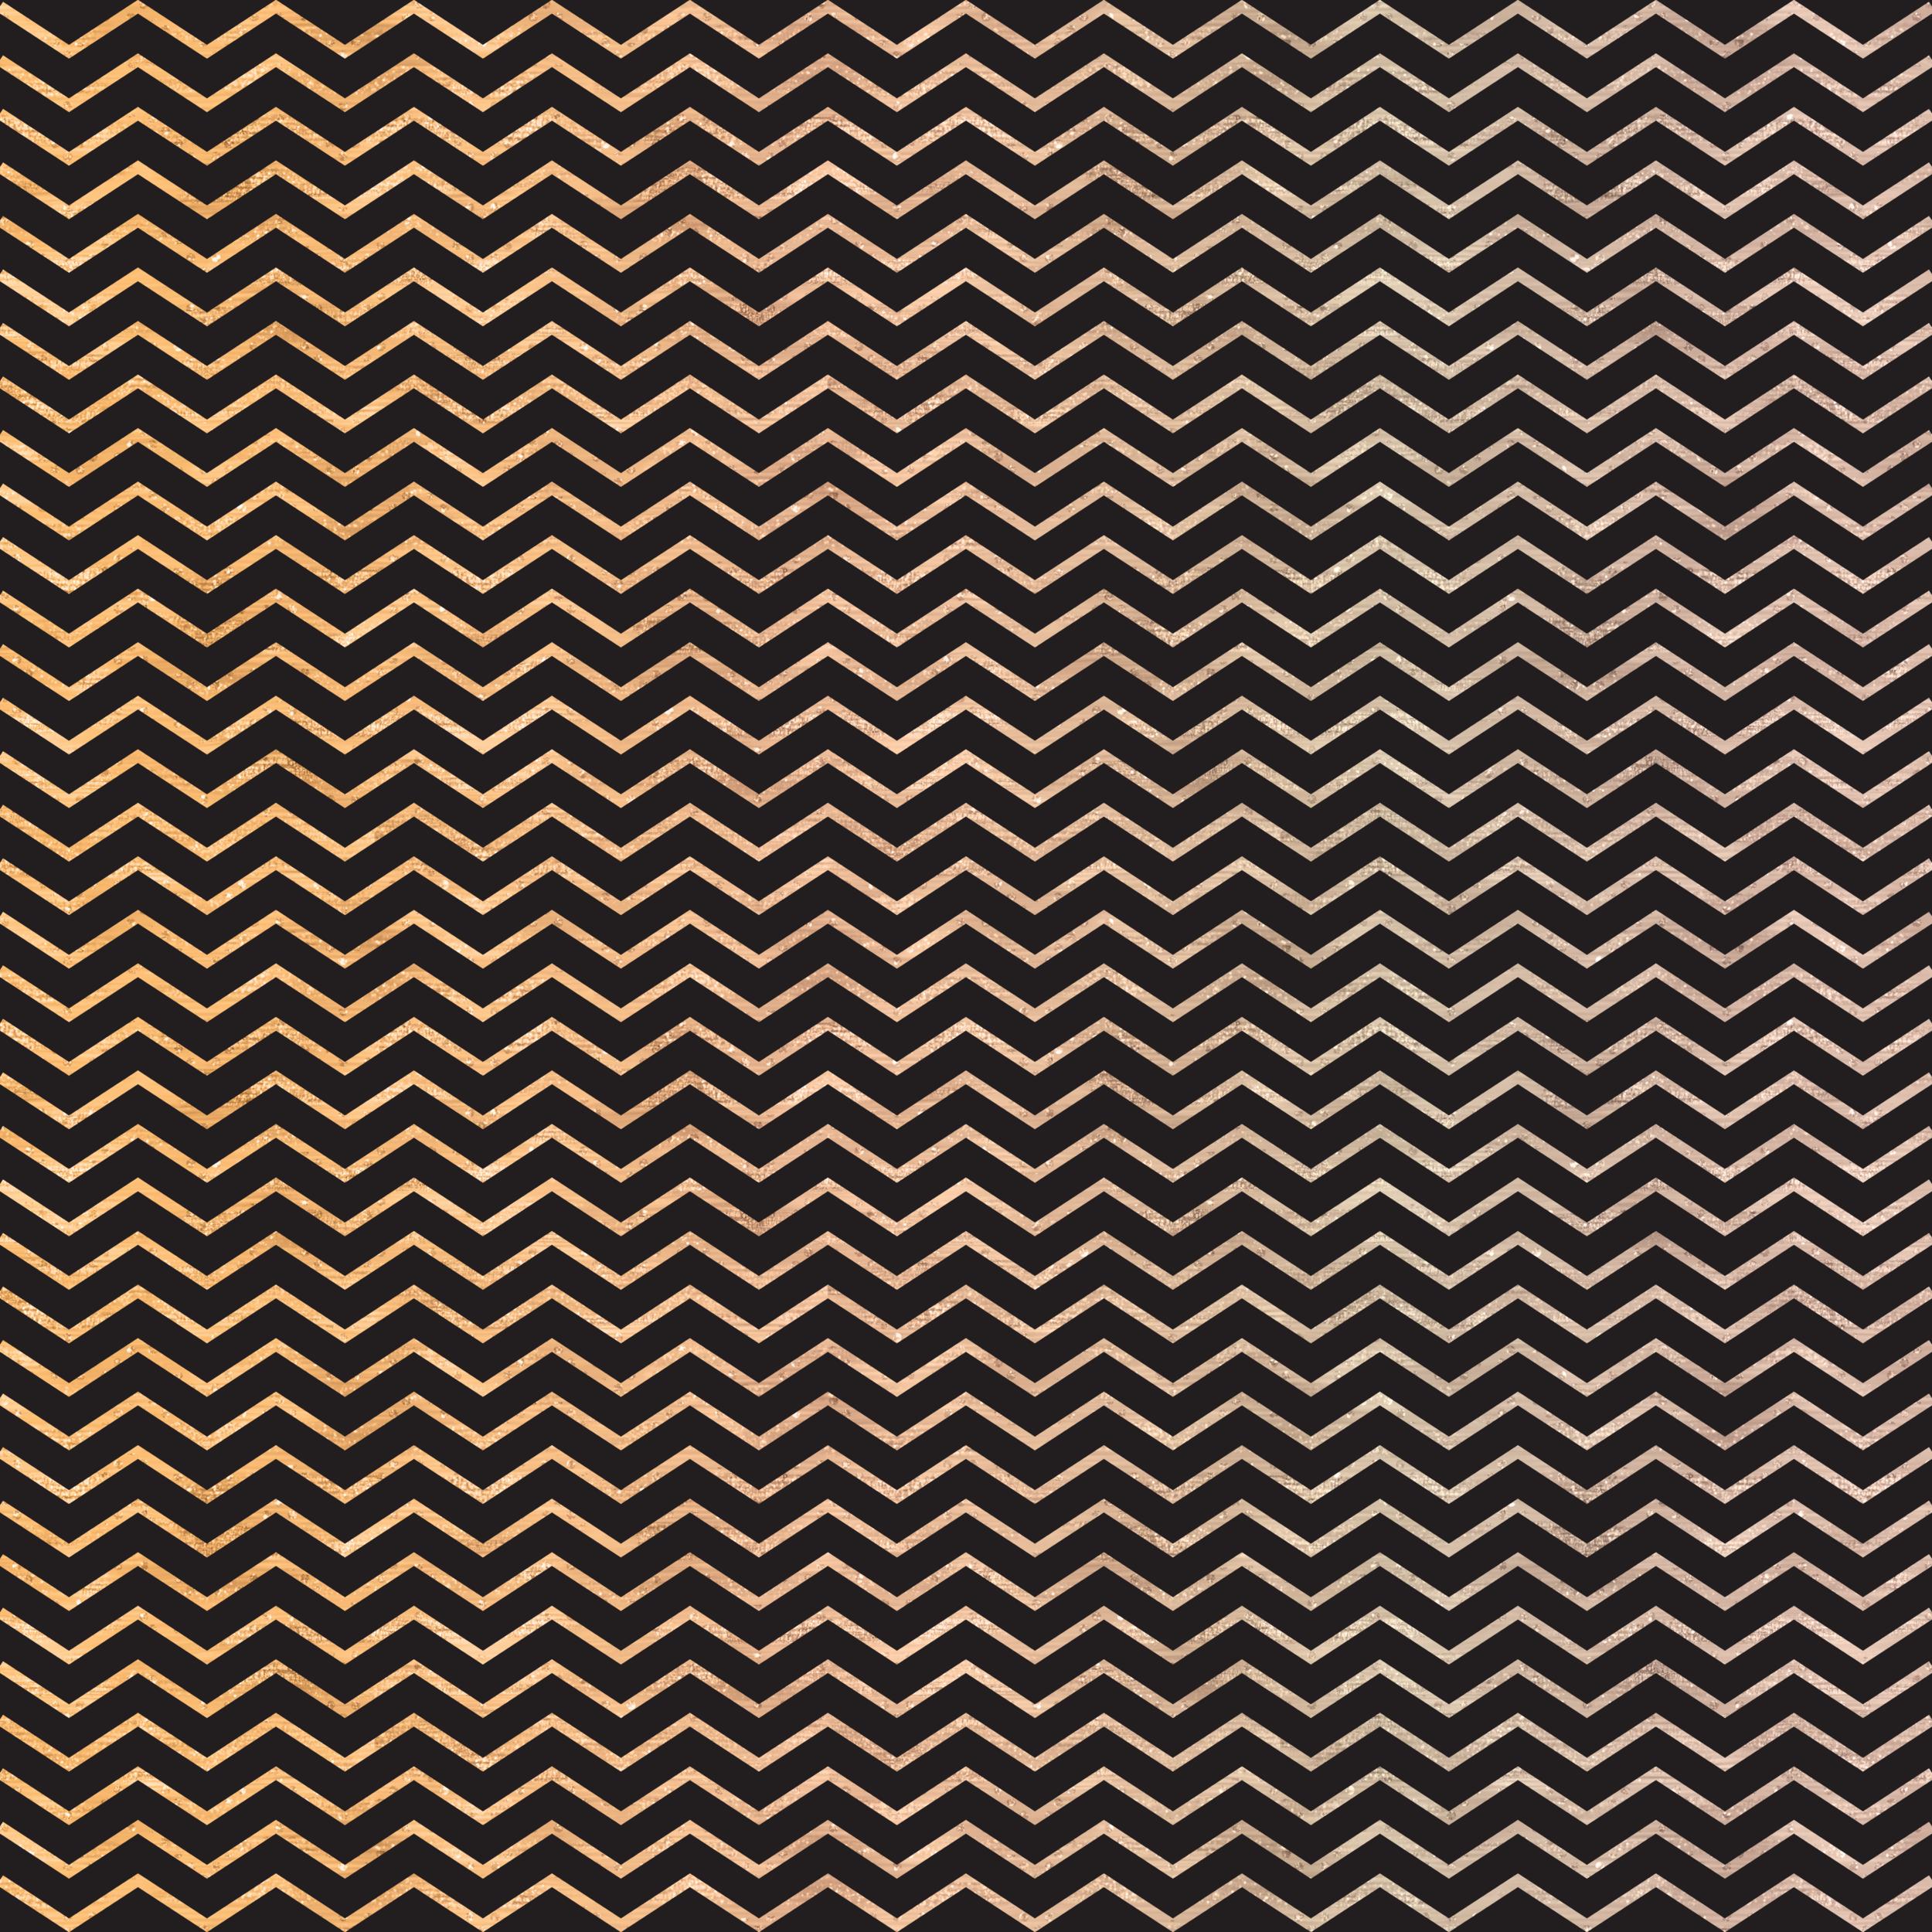 Pattern Chevron (on brown).png